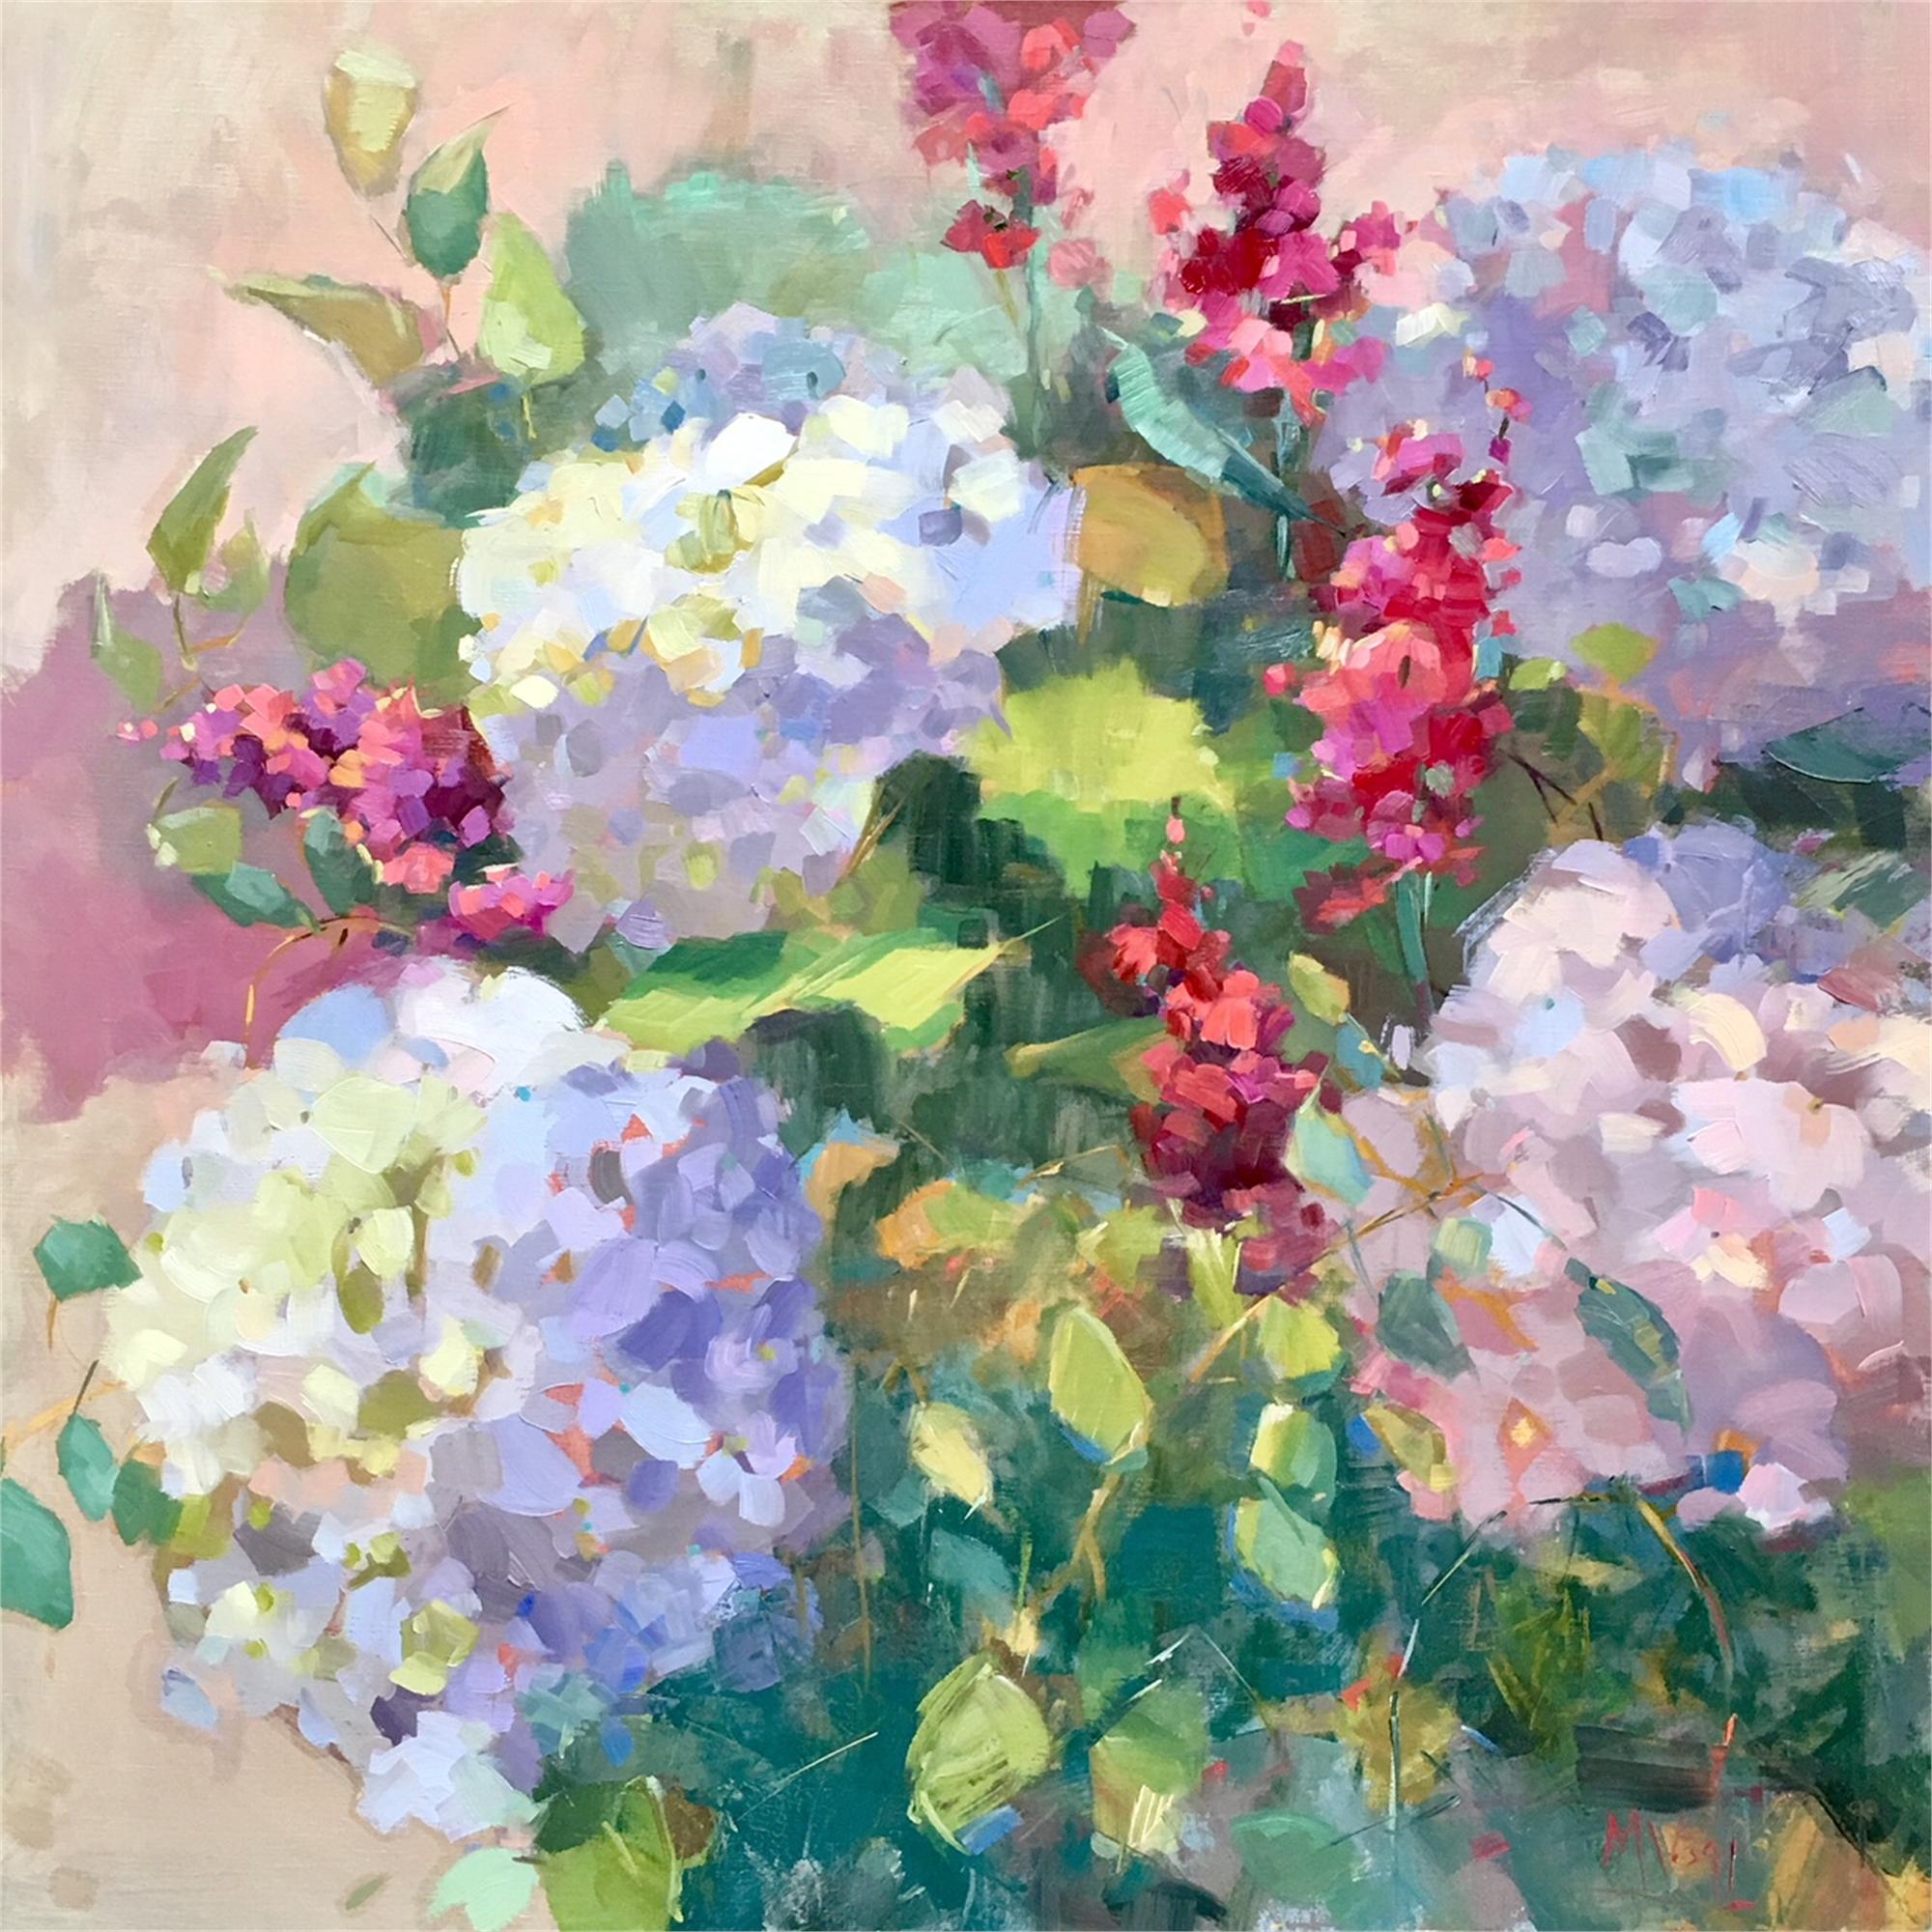 Hopeless Romantic by Marissa Vogl